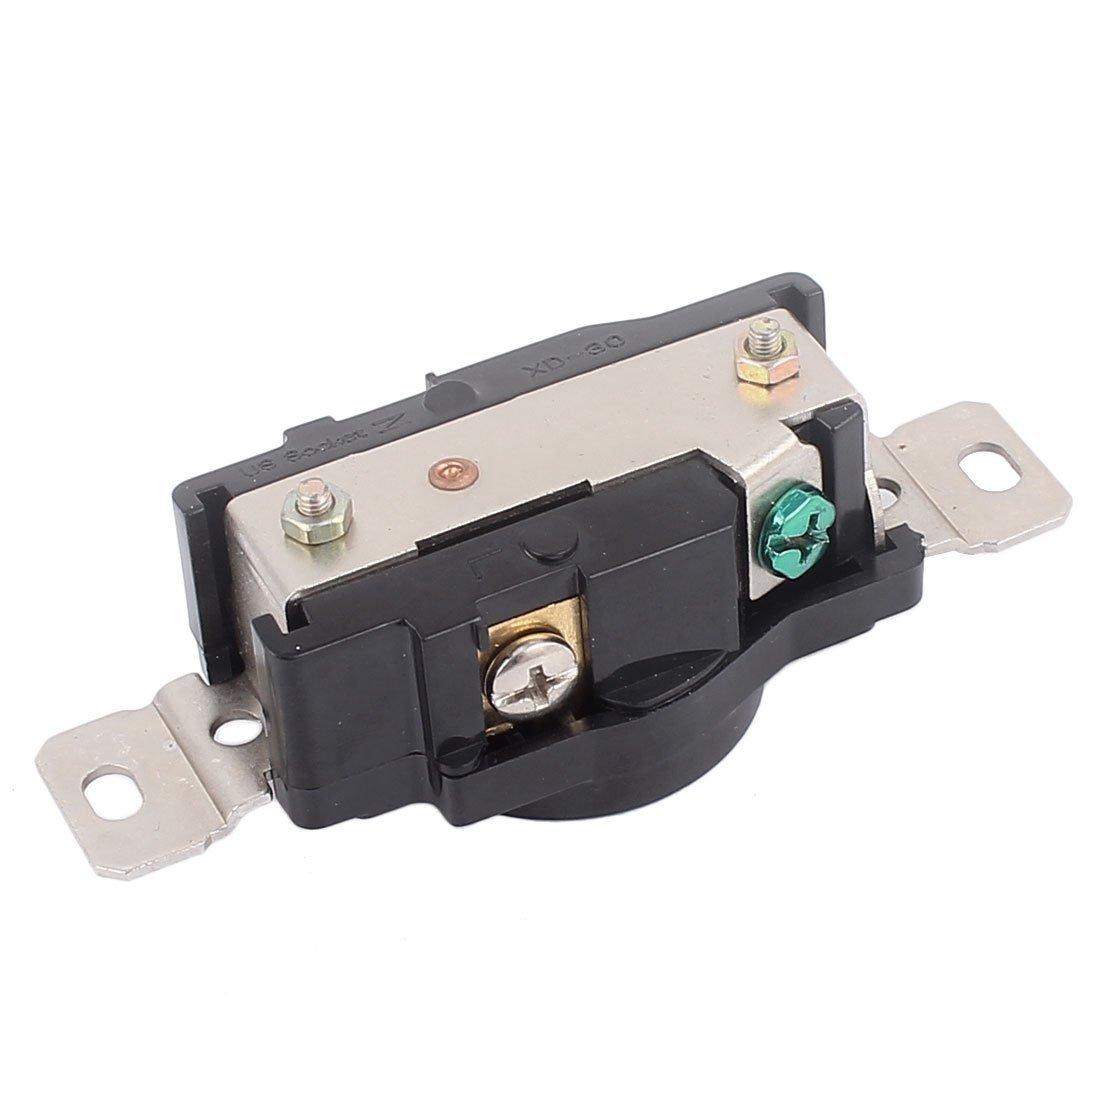 DealMux 125V 20A Twist Lock Straight Tamper Resistant Receptacle Black